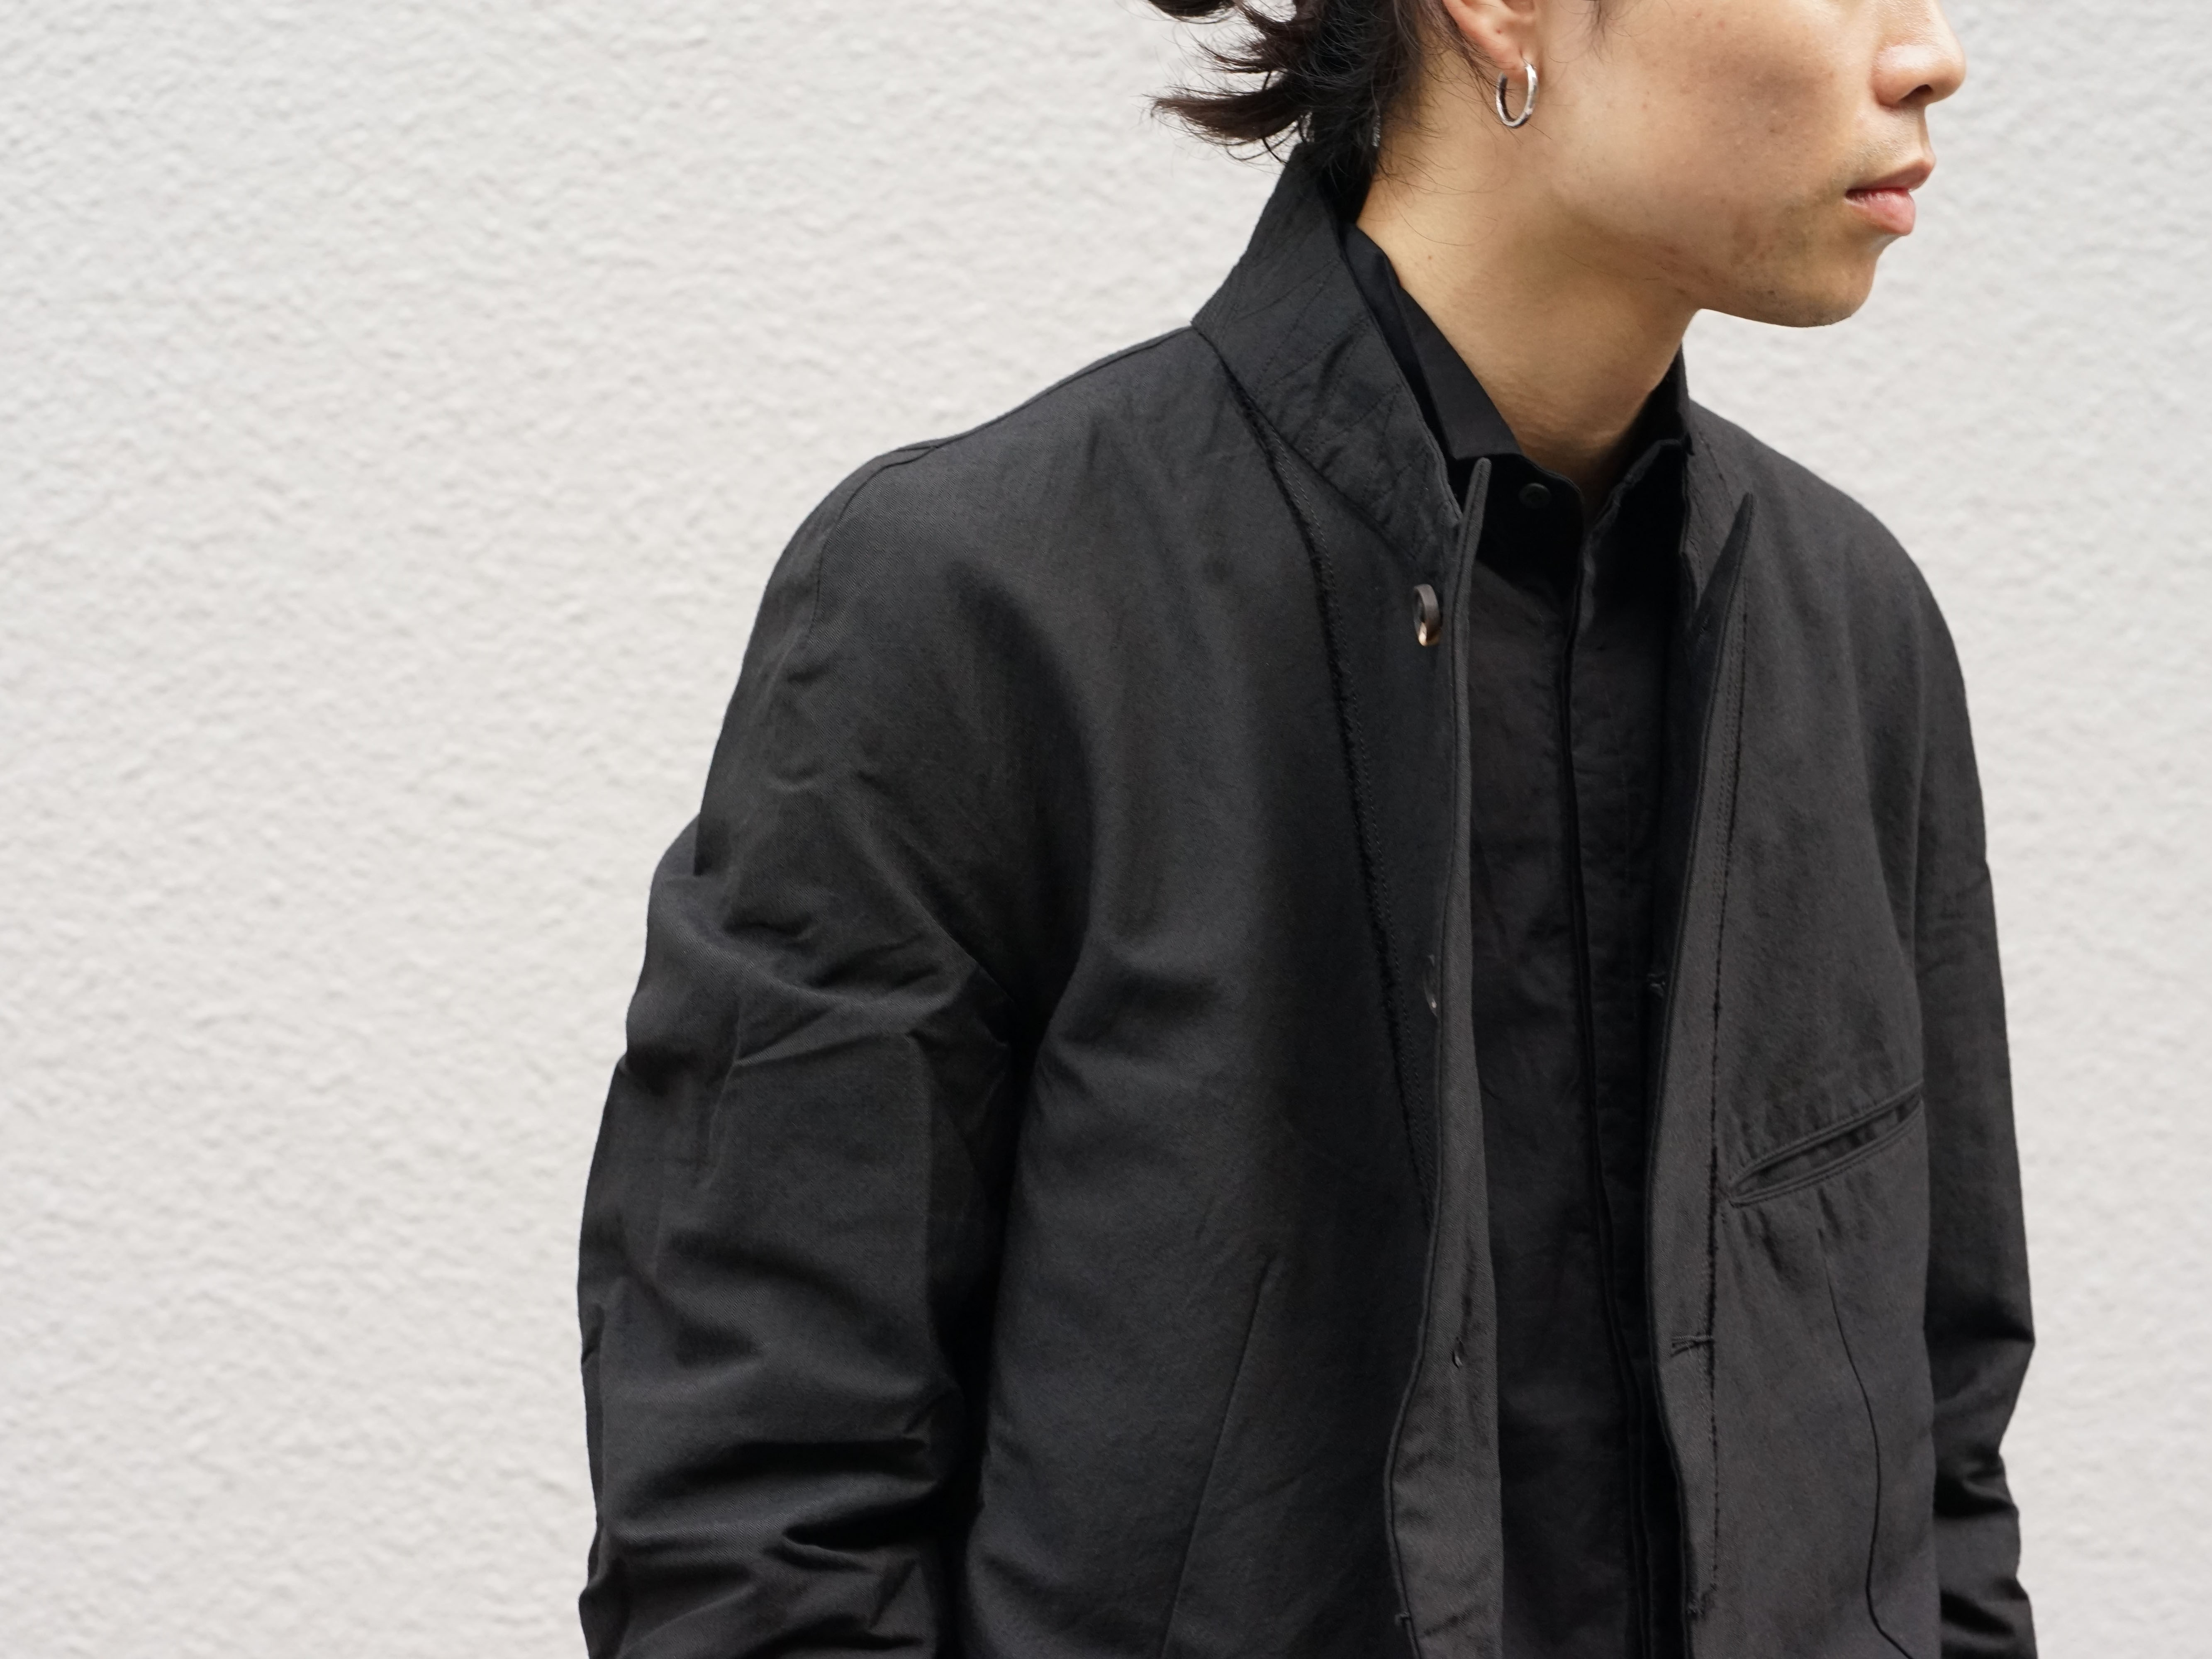 ZIGGY CHEN Stripe Gabardine Suit Style 05